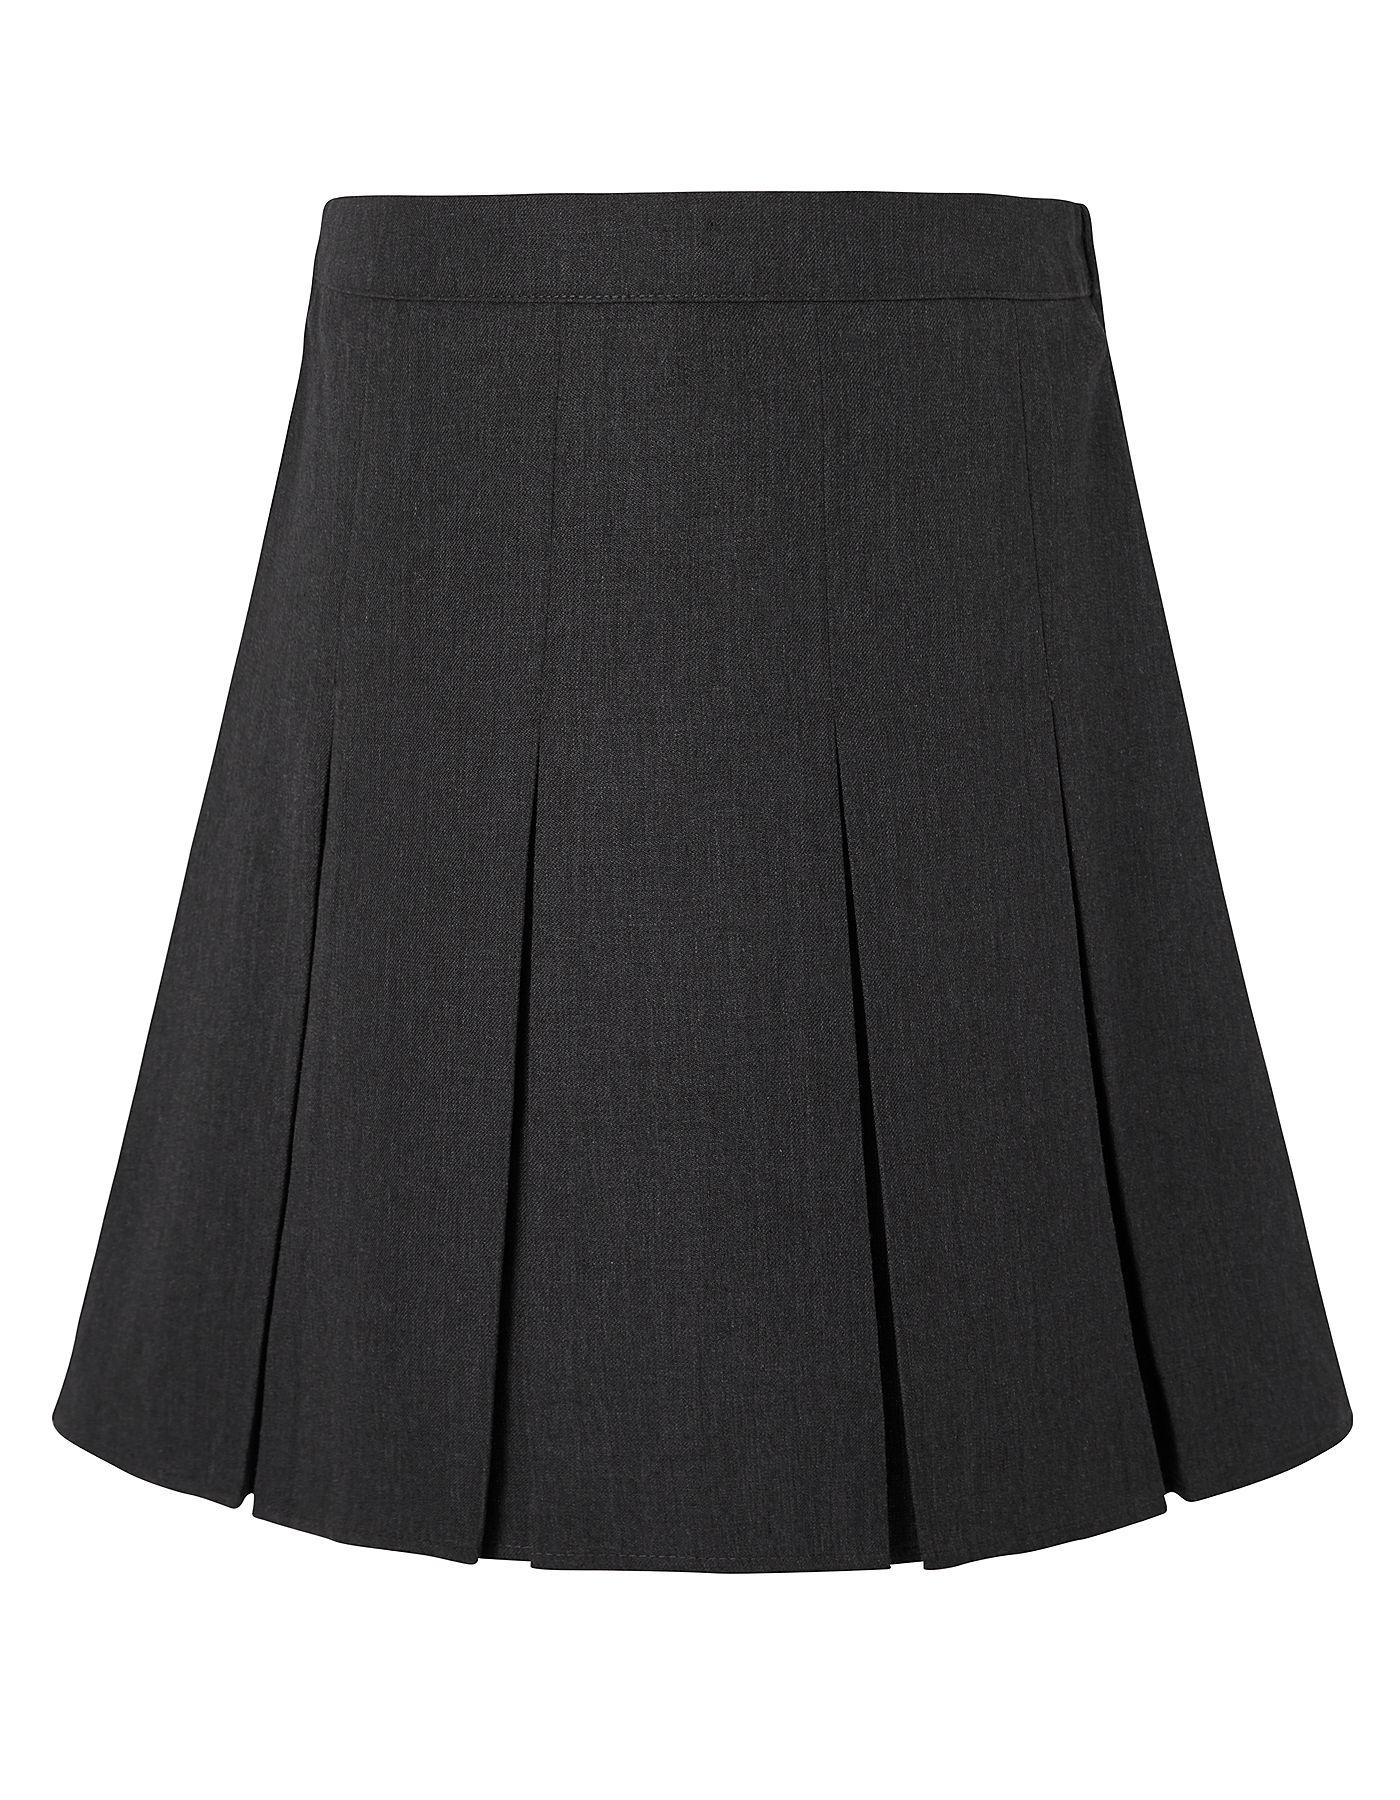 fd57742c13 Grey Pleated School Skirt Asda